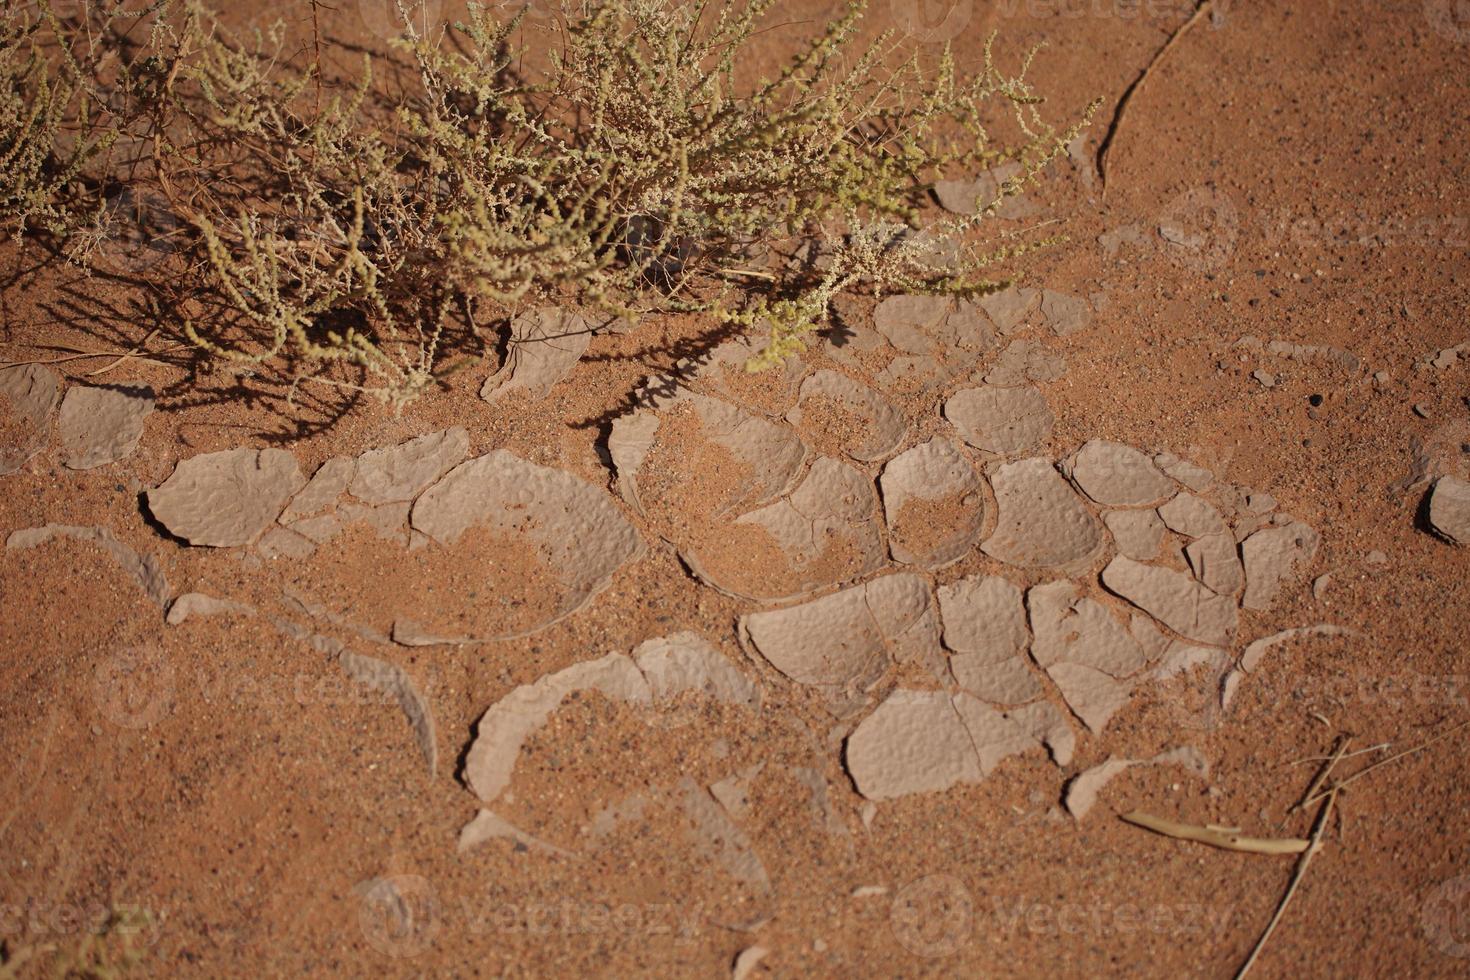 trockenheit em der wüste sahara foto